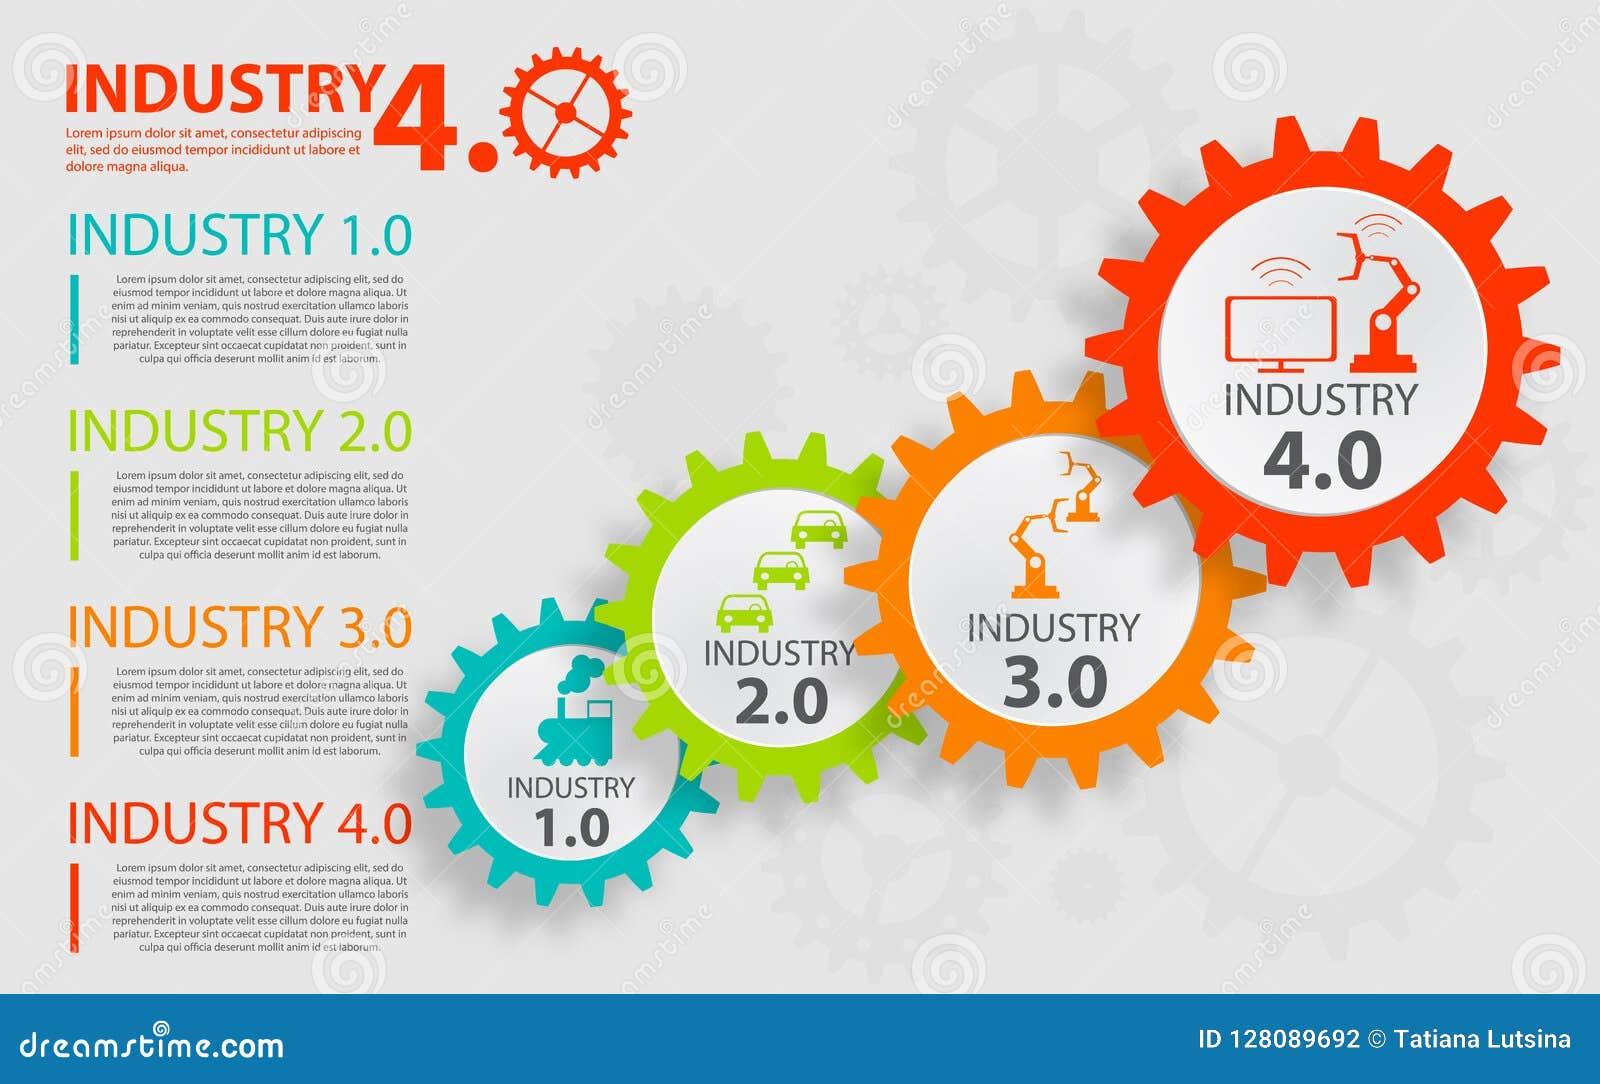 Sistemas físicos, nube que computa, industria de computación cognoscitiva 4 0 infographic Internet o industria industrial 4 0 inf